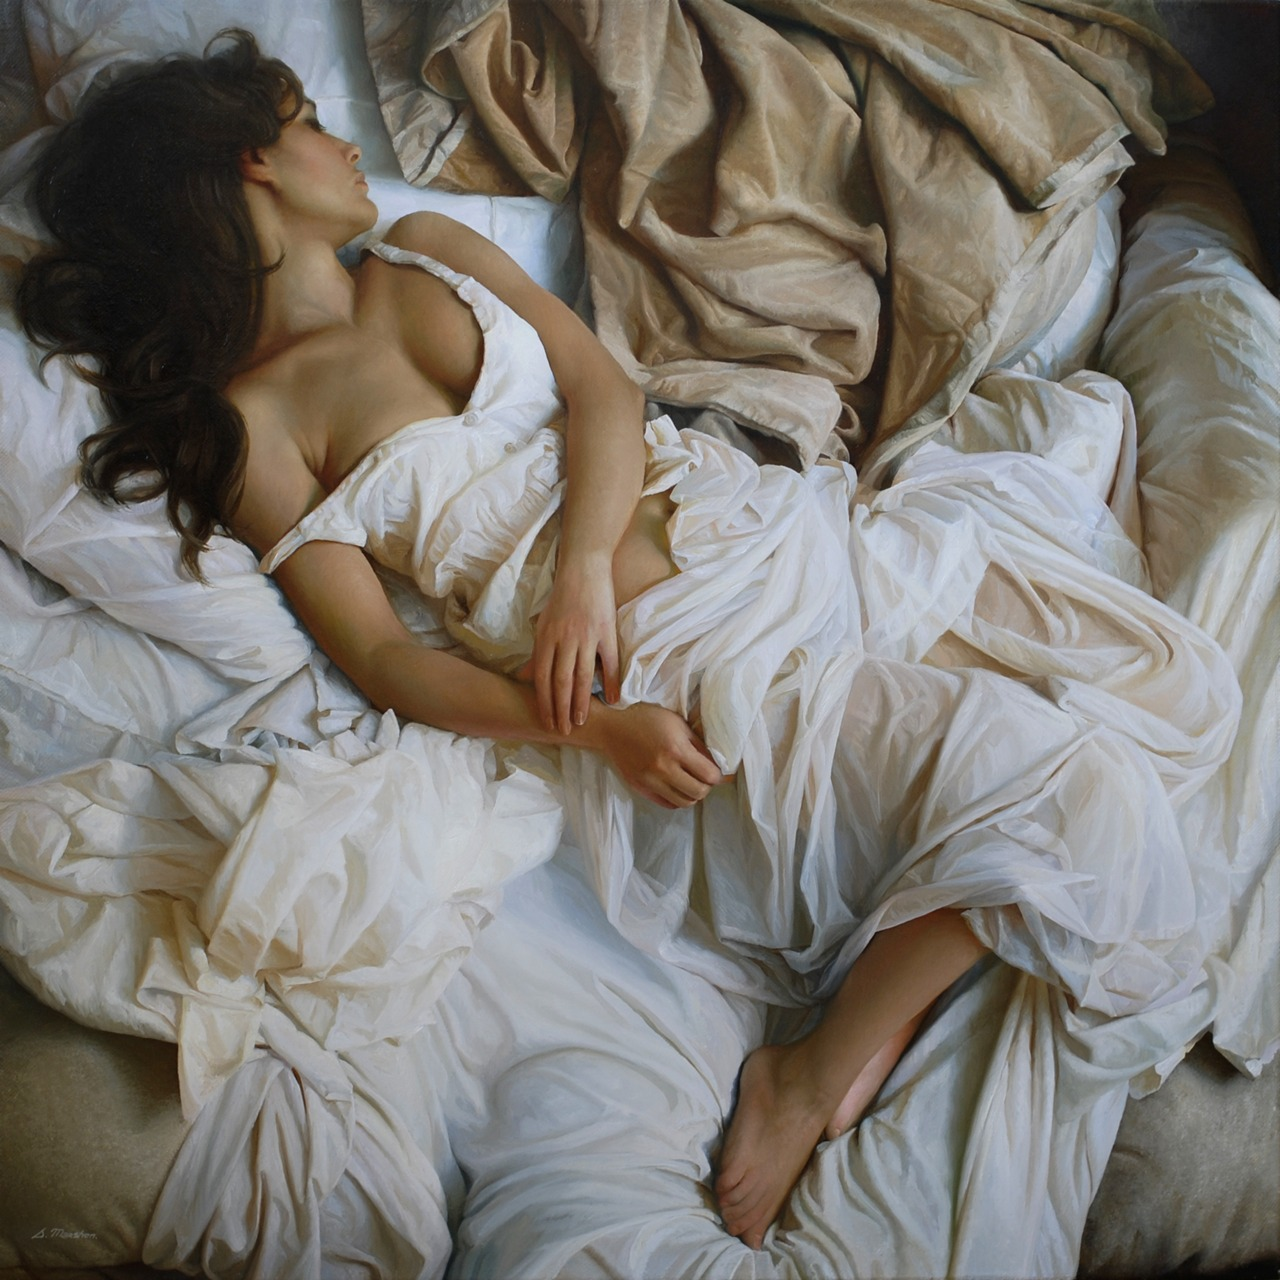 Women's images by a Russian realist artist Sergey Marshennikov - 13